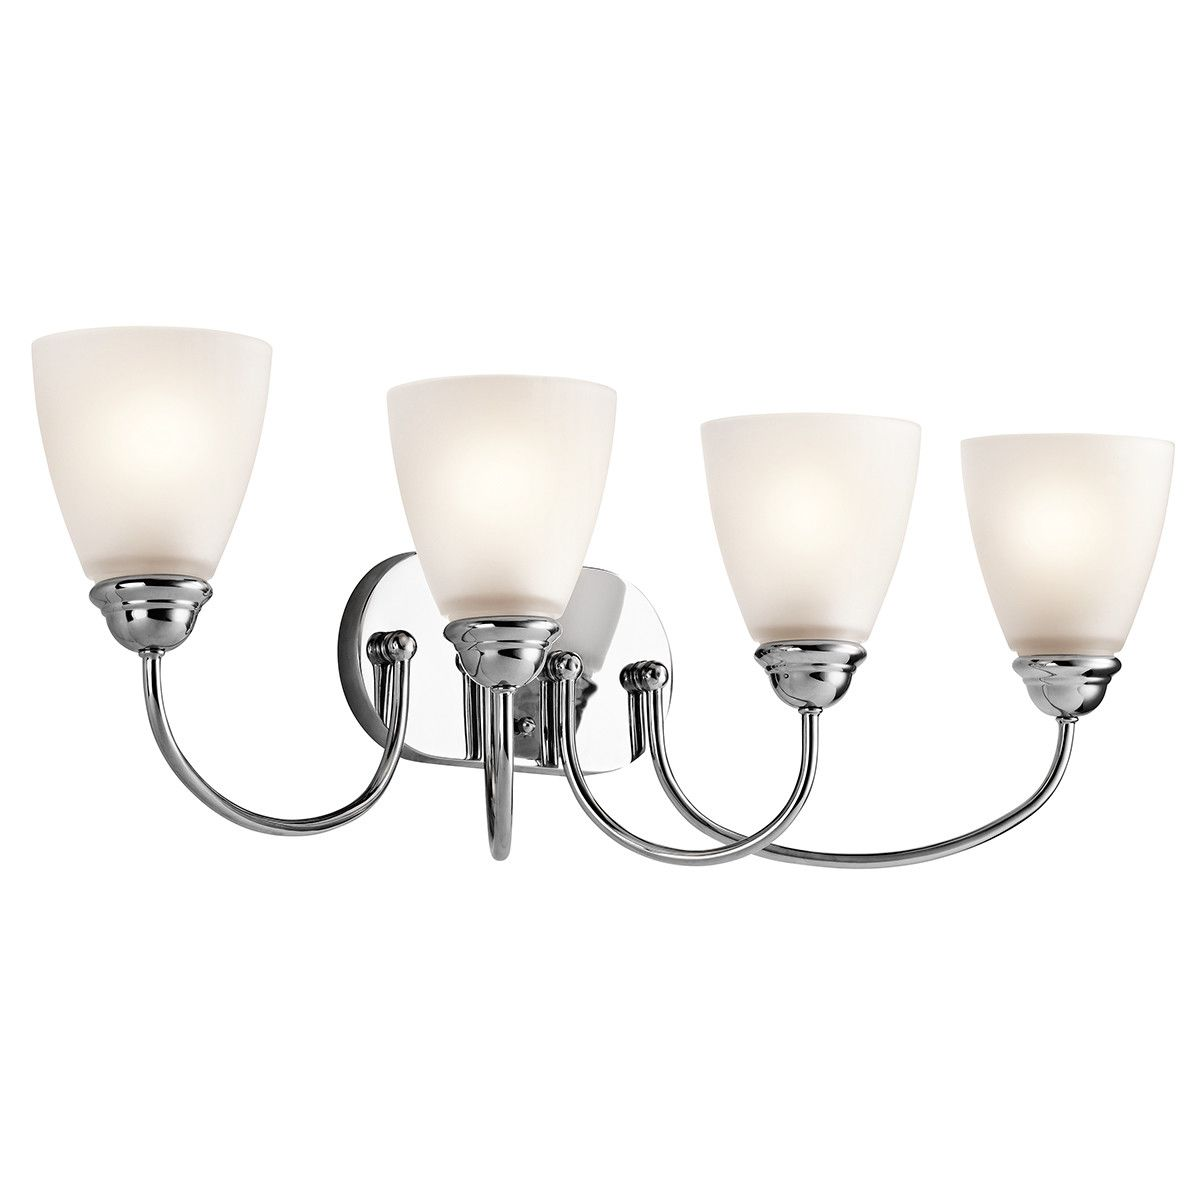 Amelia wall mount light vanity light products pinterest